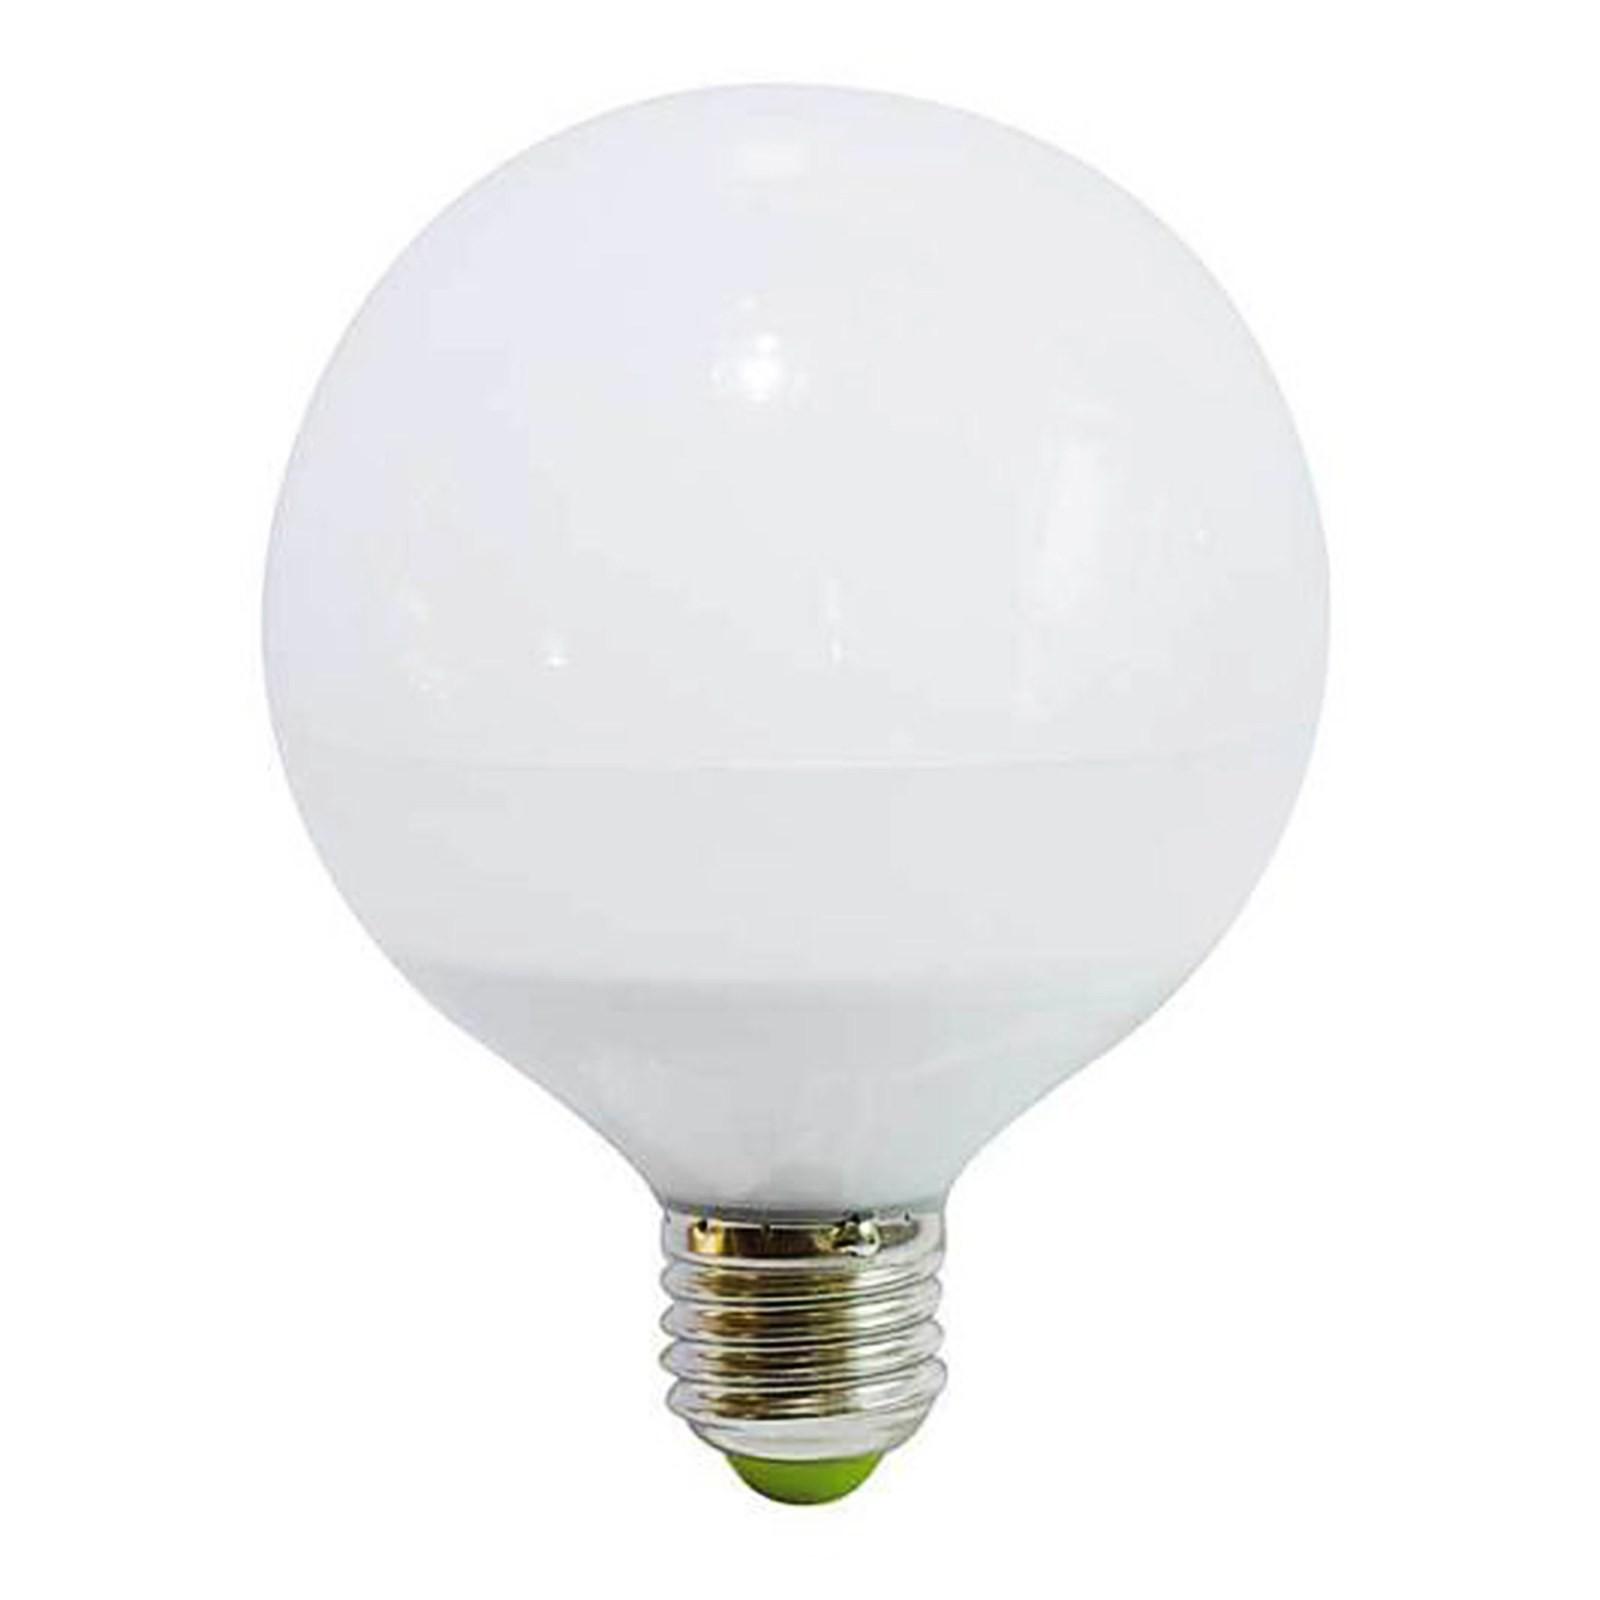 3 pz lampade lampada lampadine a led luce calda attacco for Lampadine watt